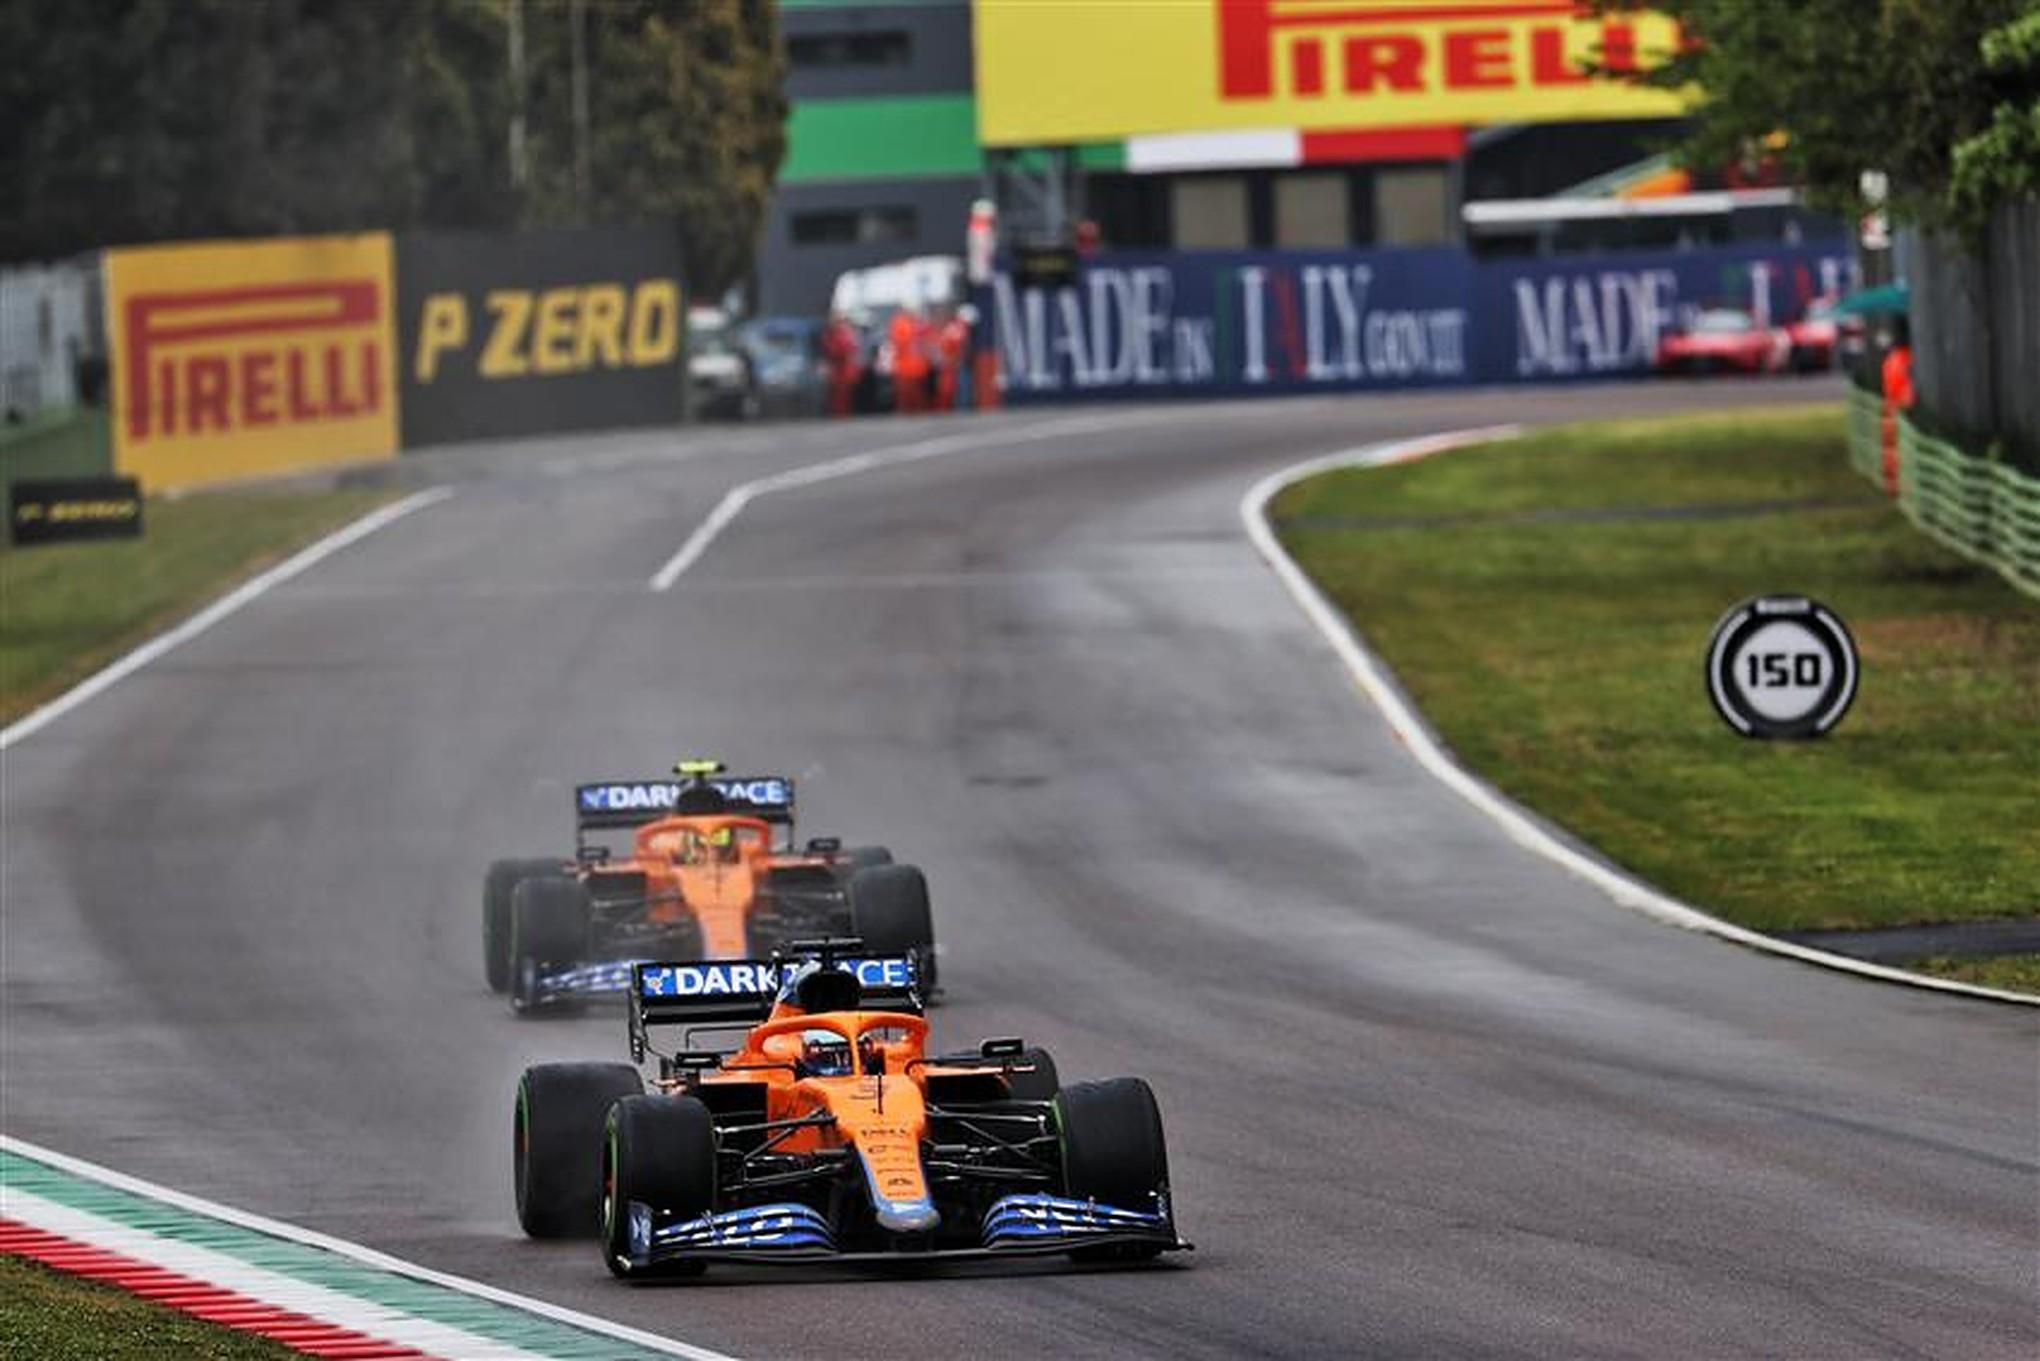 Daniel Ricciardo and Lando Norris team orders at Imola - Formula1News.co.uk